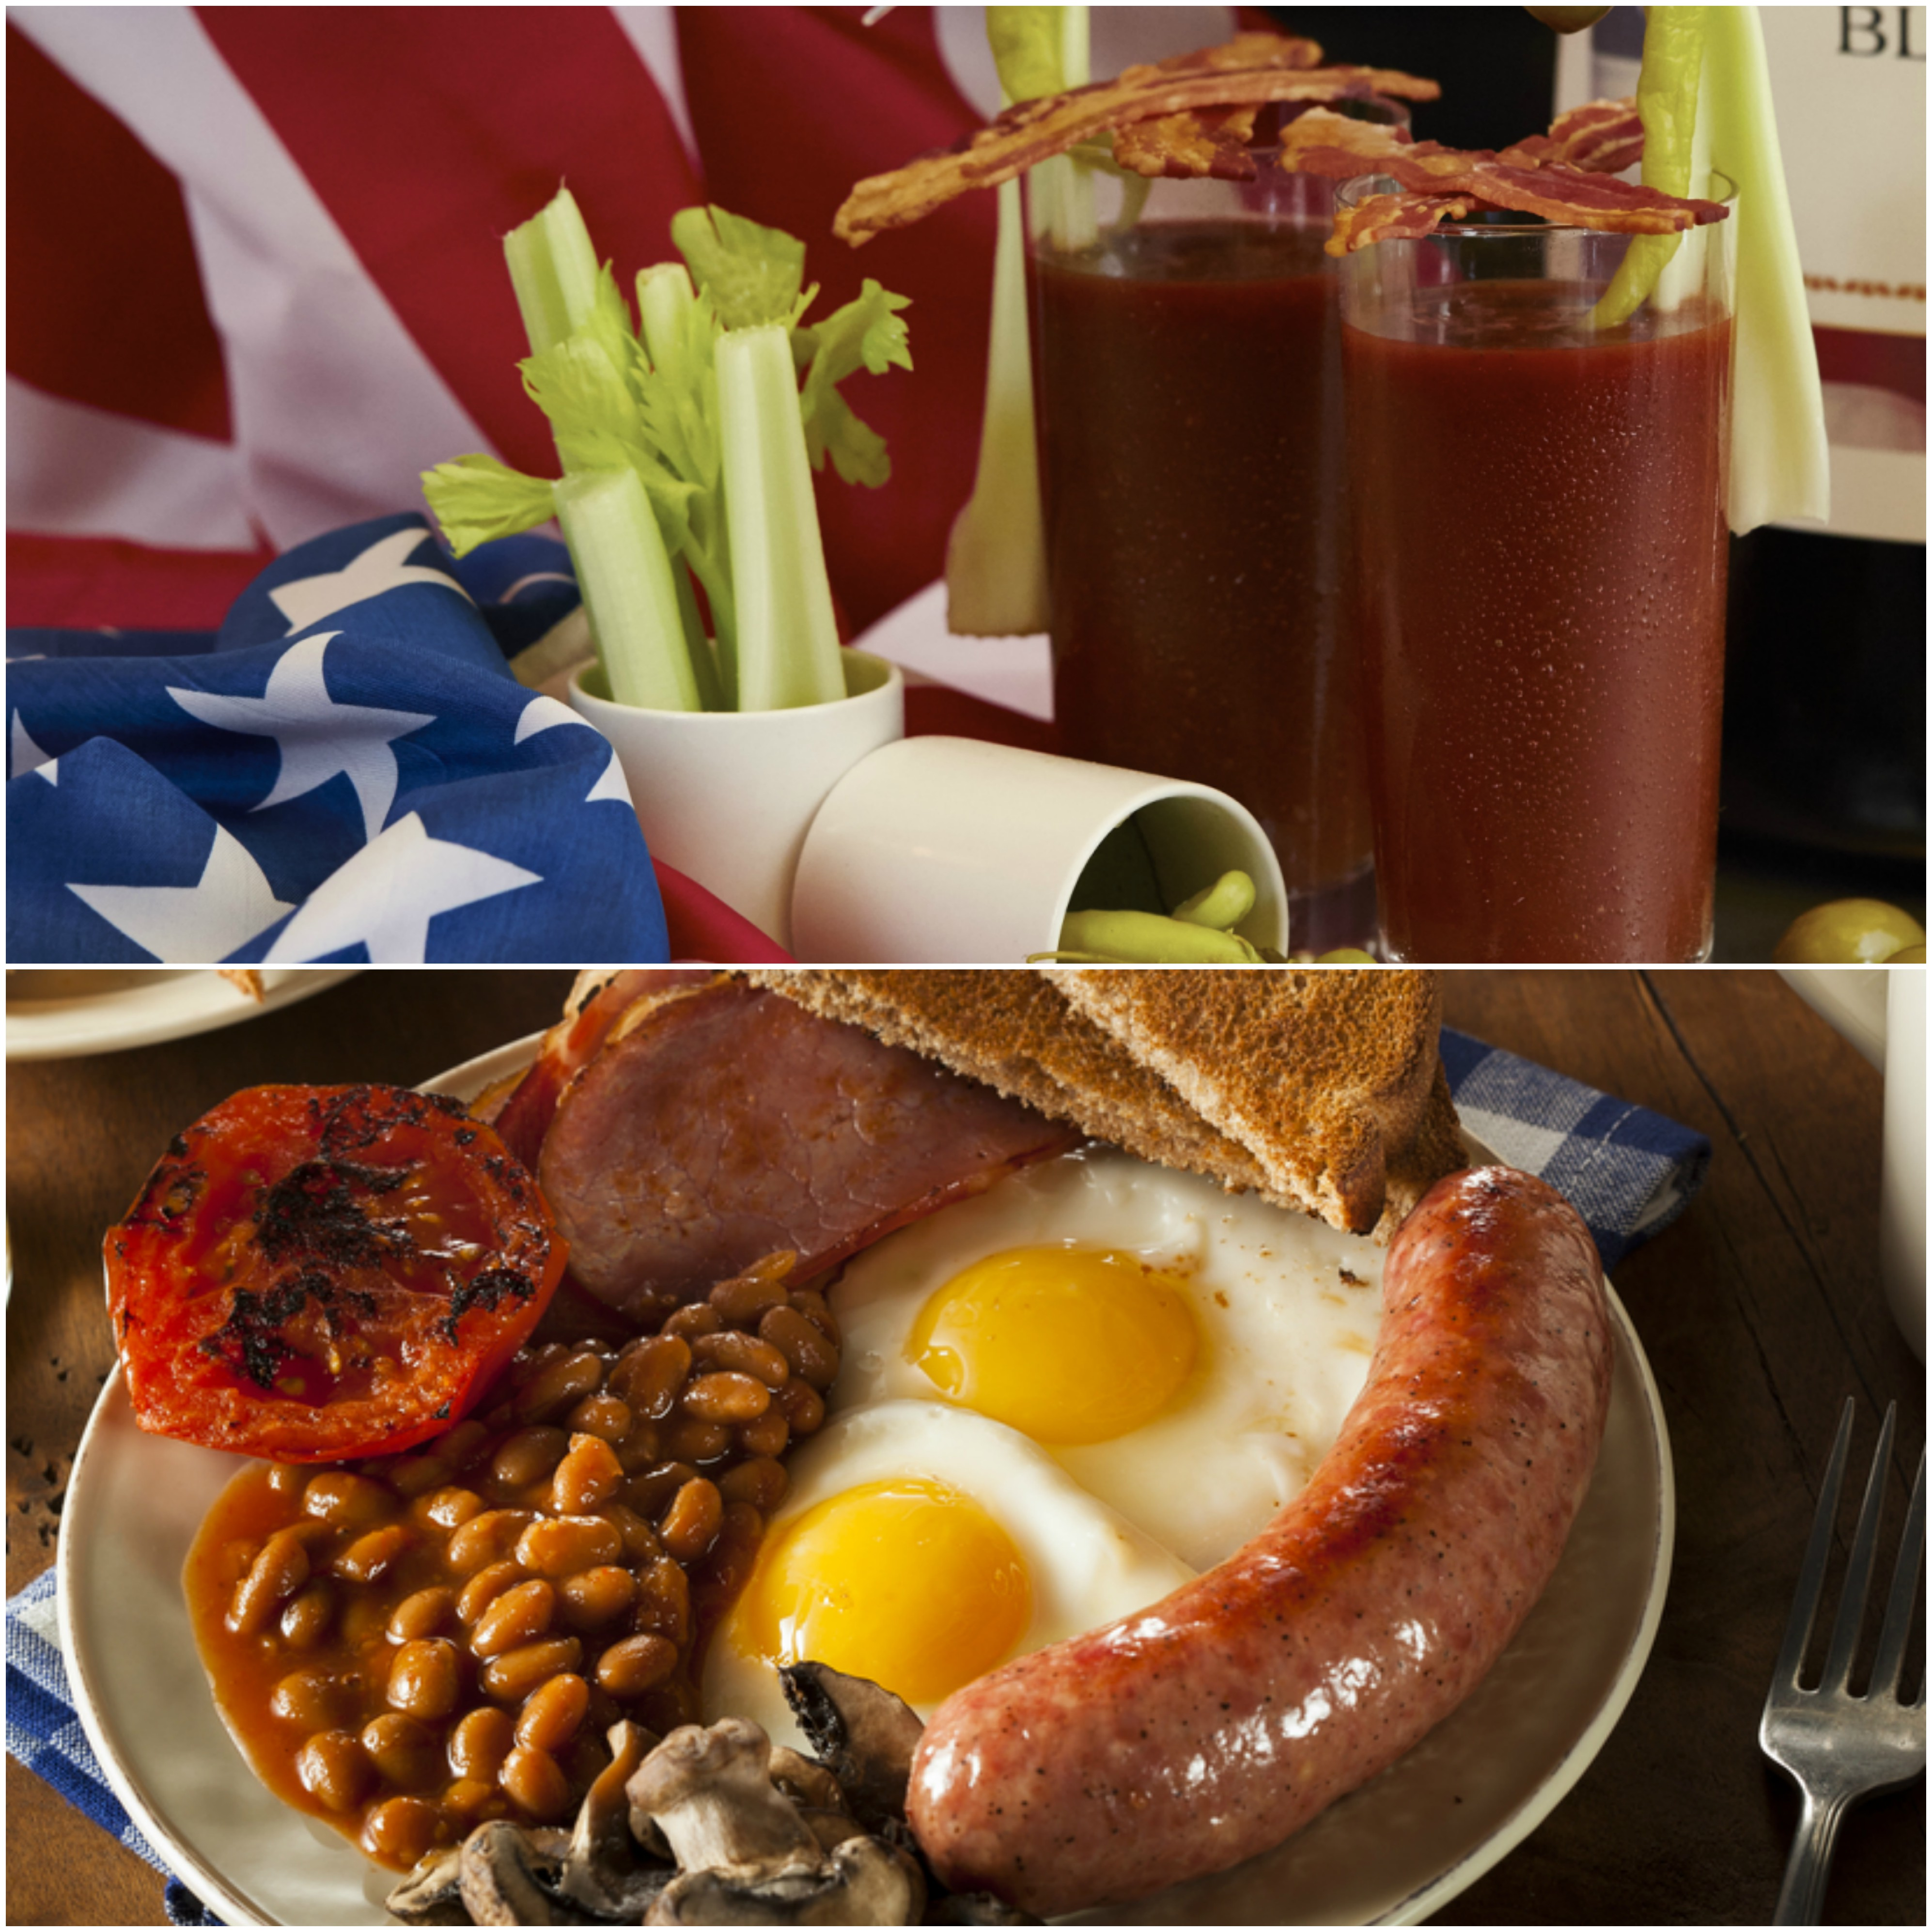 v8-full-english-breakfast-and-bloody-mary